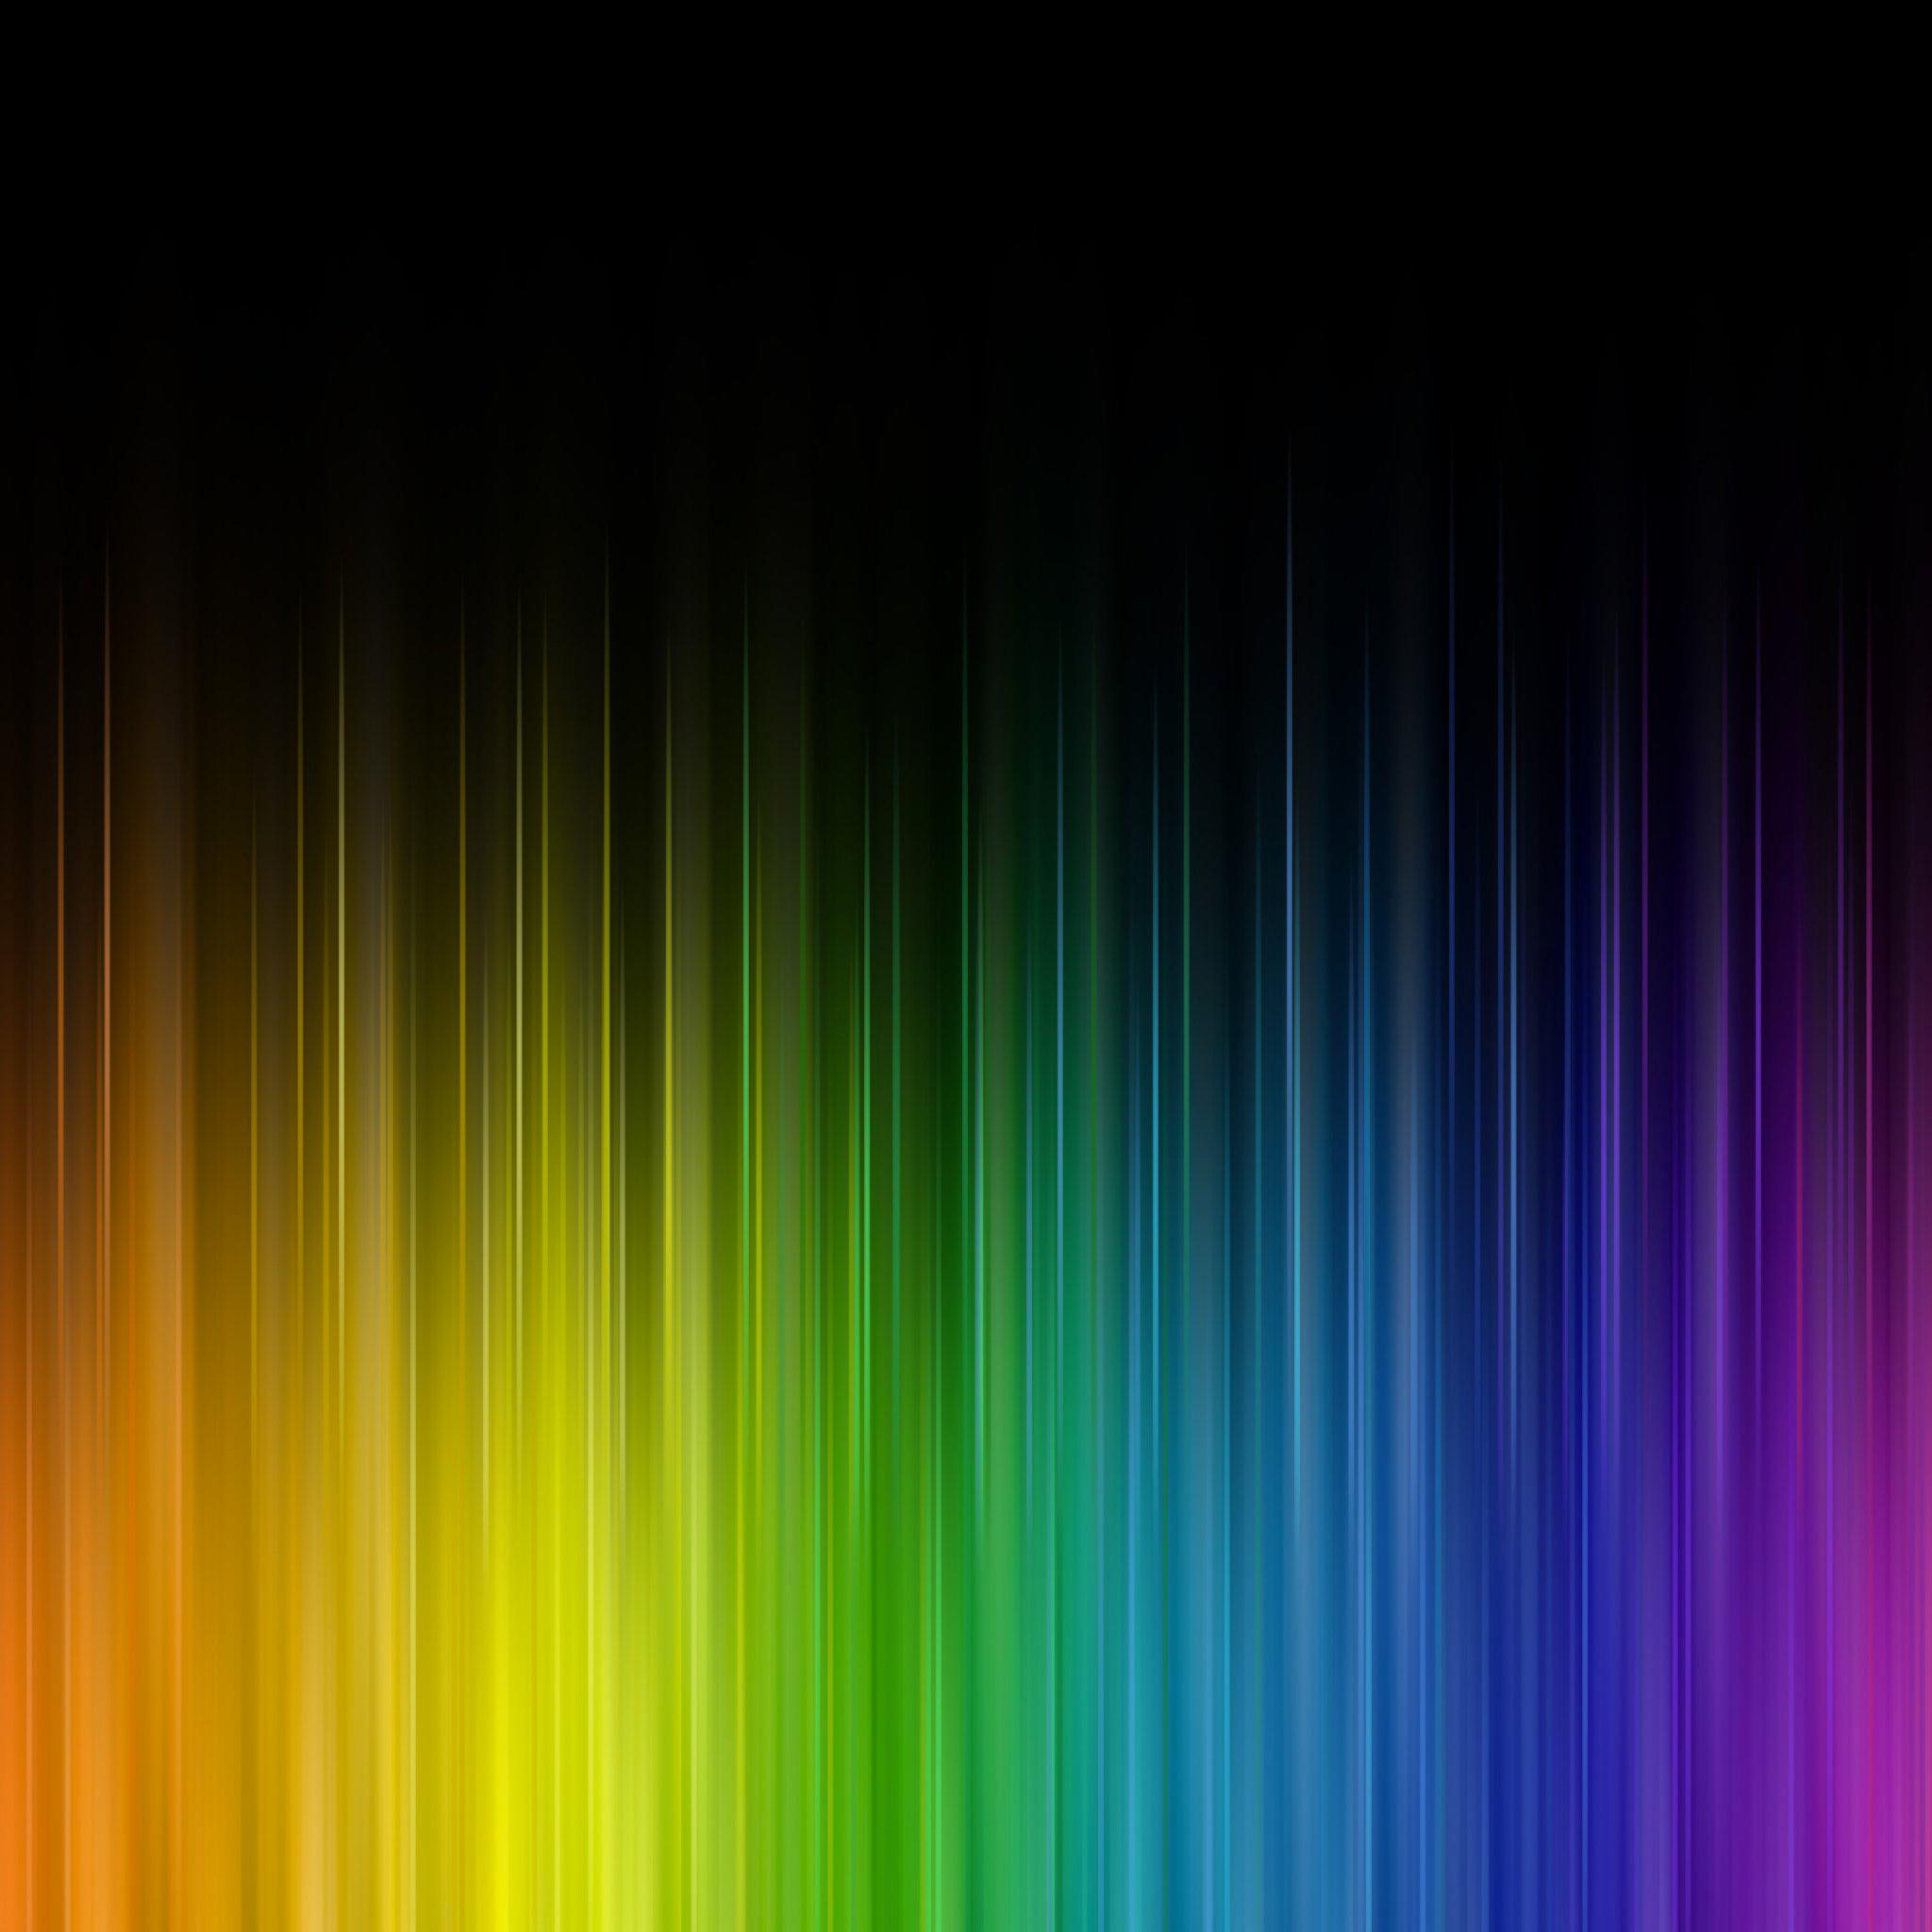 Rainbow-Colors3Wallpapers-ipad-Retina